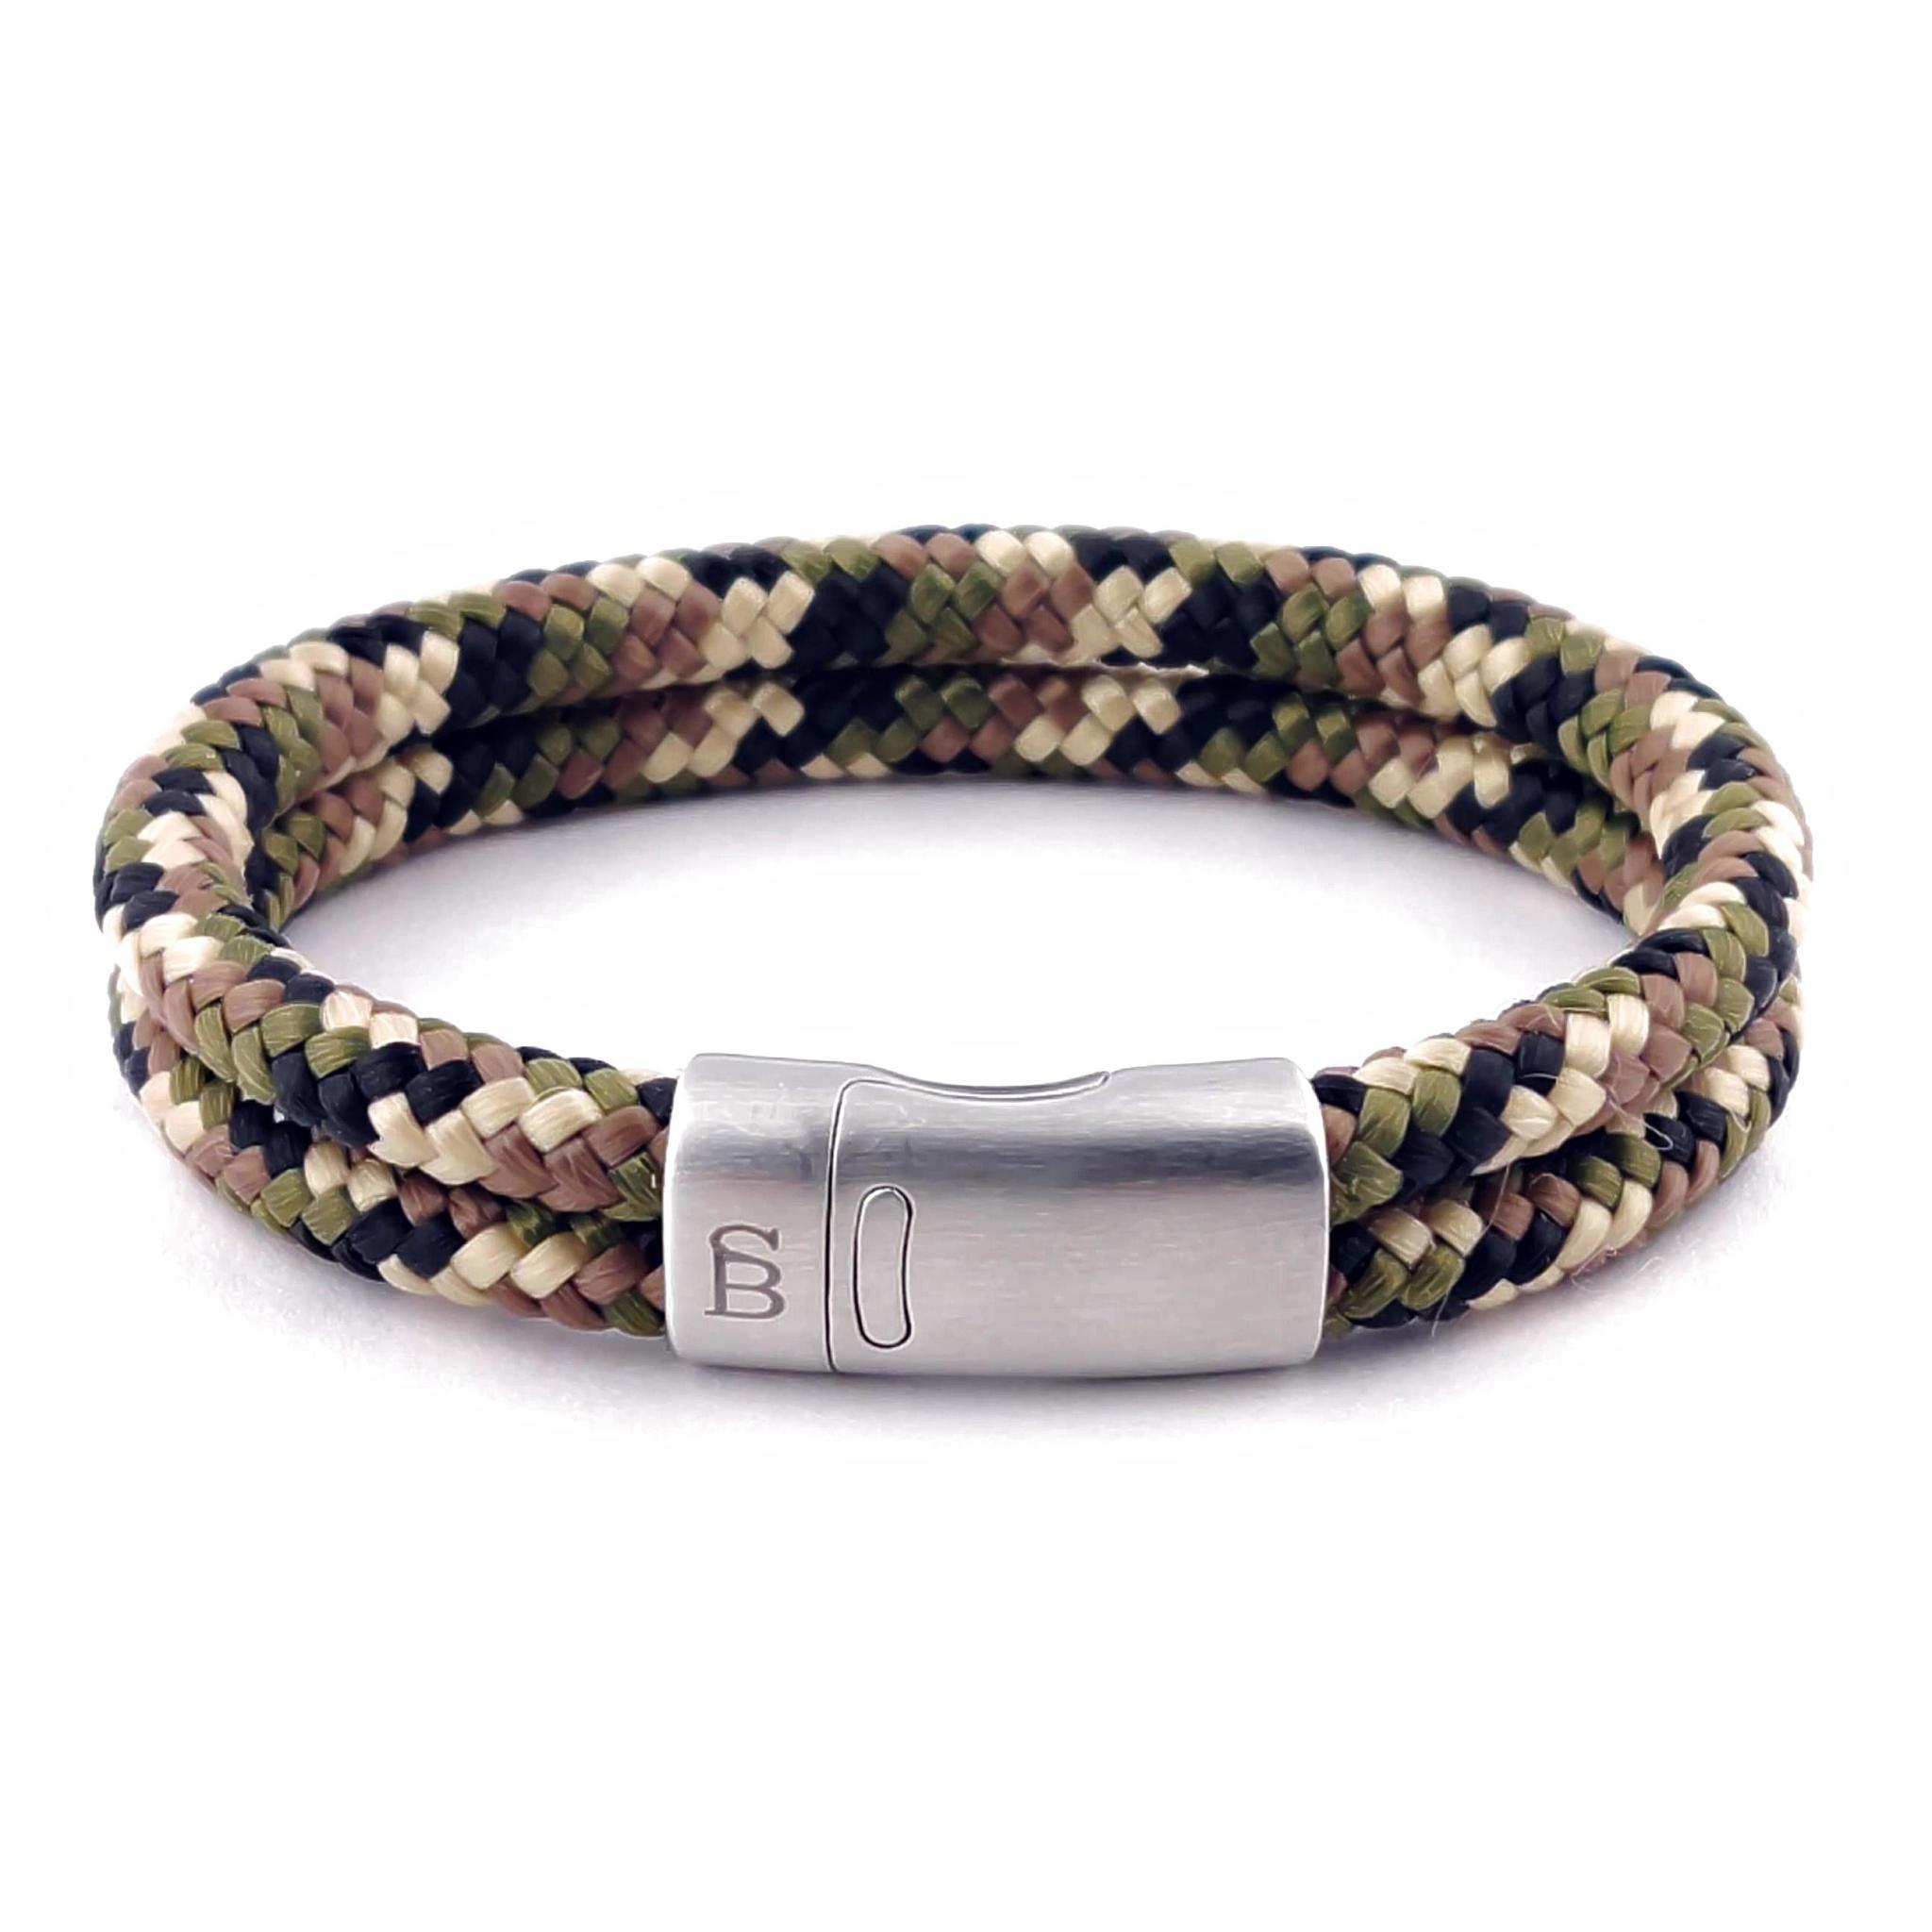 Steel & Barnett Rope bracelet Lake - Camouflage - Size M